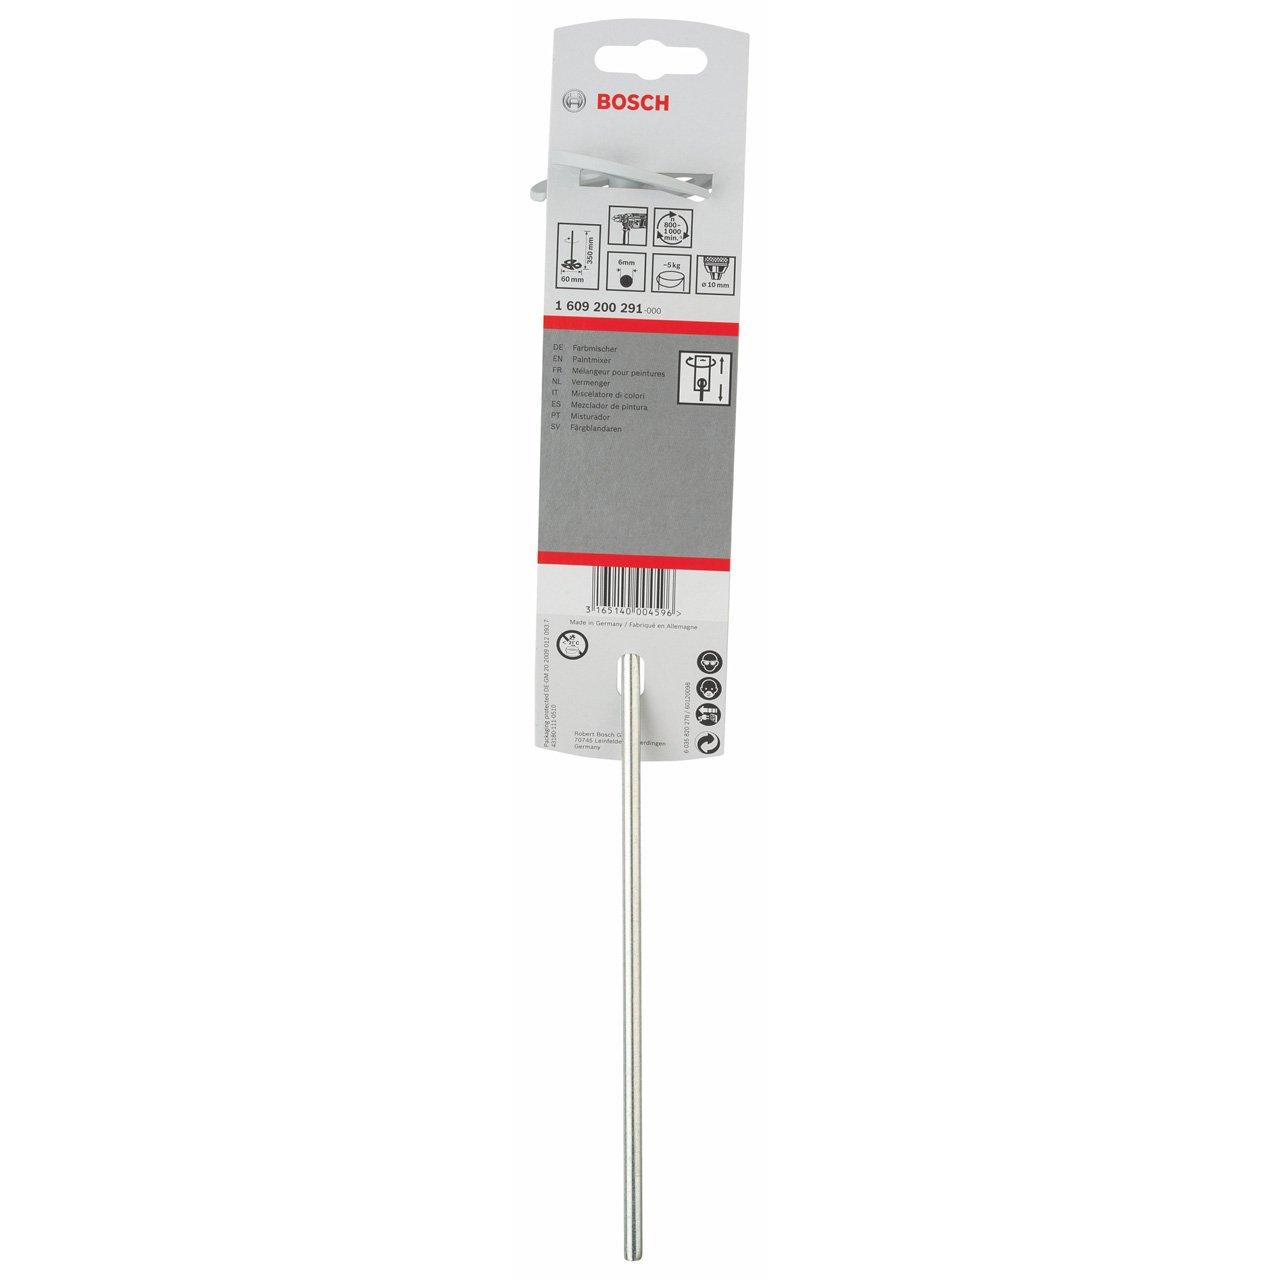 Bosch 1609200291 Malaxeur pour perceuses Ø 60 mm Bosch Professional